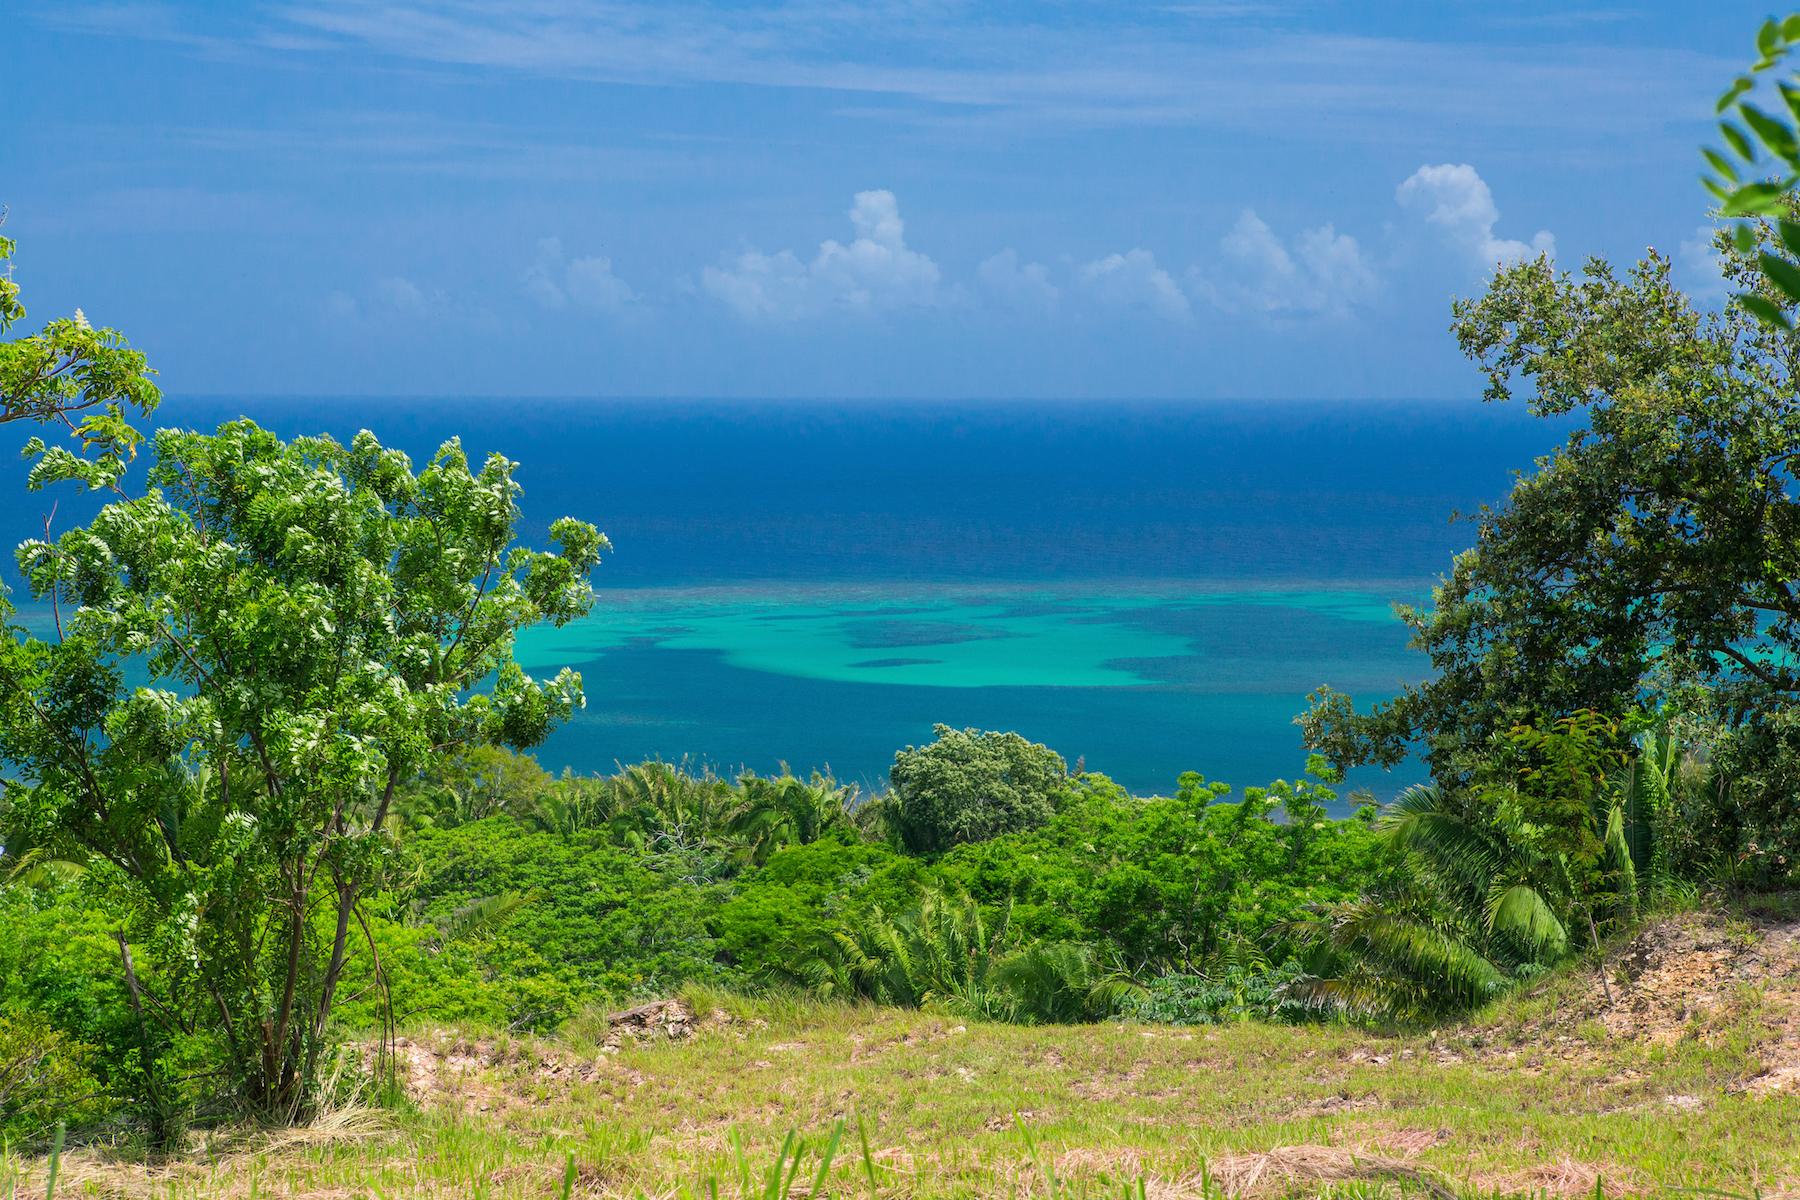 Property 為 出售 在 Crawfish Rock Development Property - 650 Feet Beachfrontage Crawfish Rock Roatan, Bay Islands 34101 Honduras